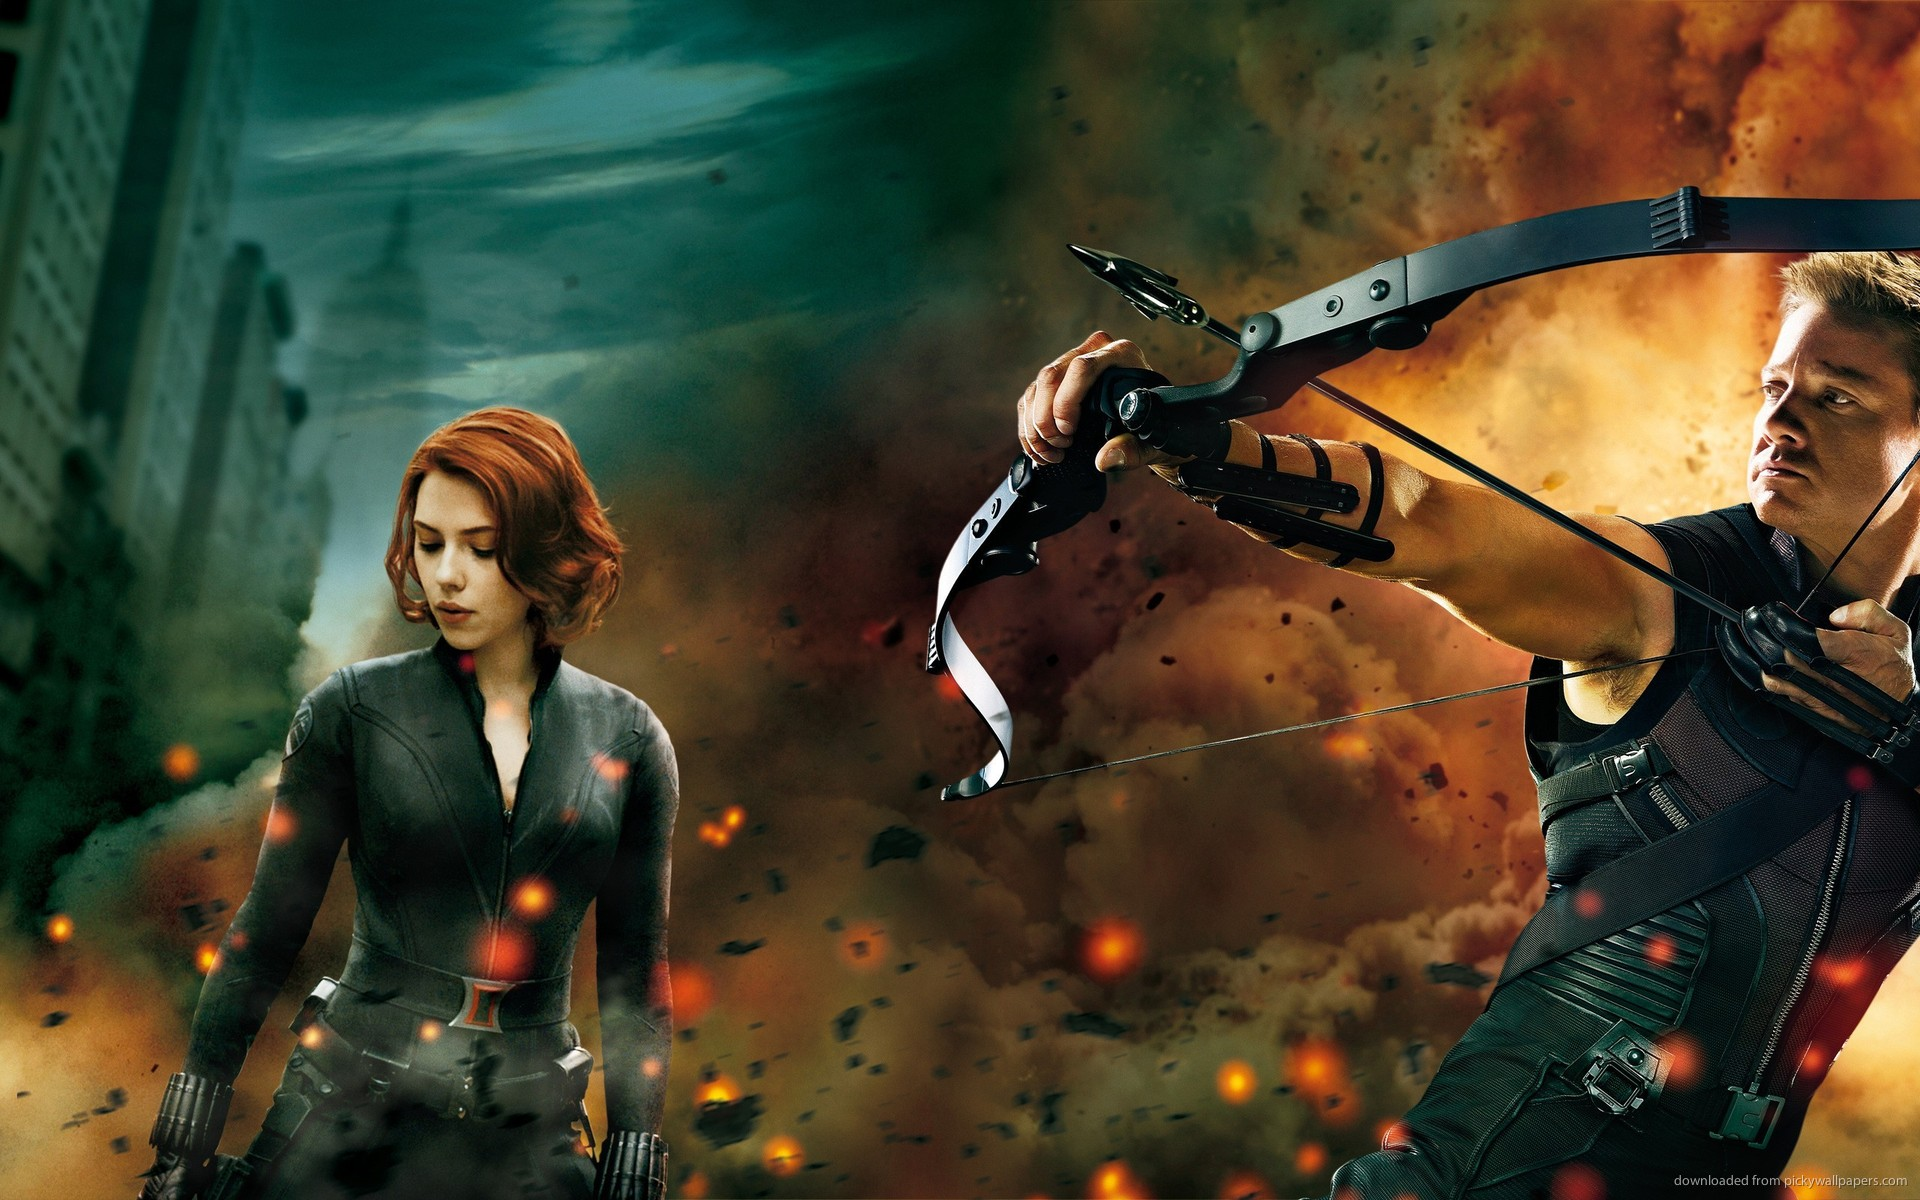 Download 1920x1200 Black Widow And Hawkeye Wallpaper 1920x1200